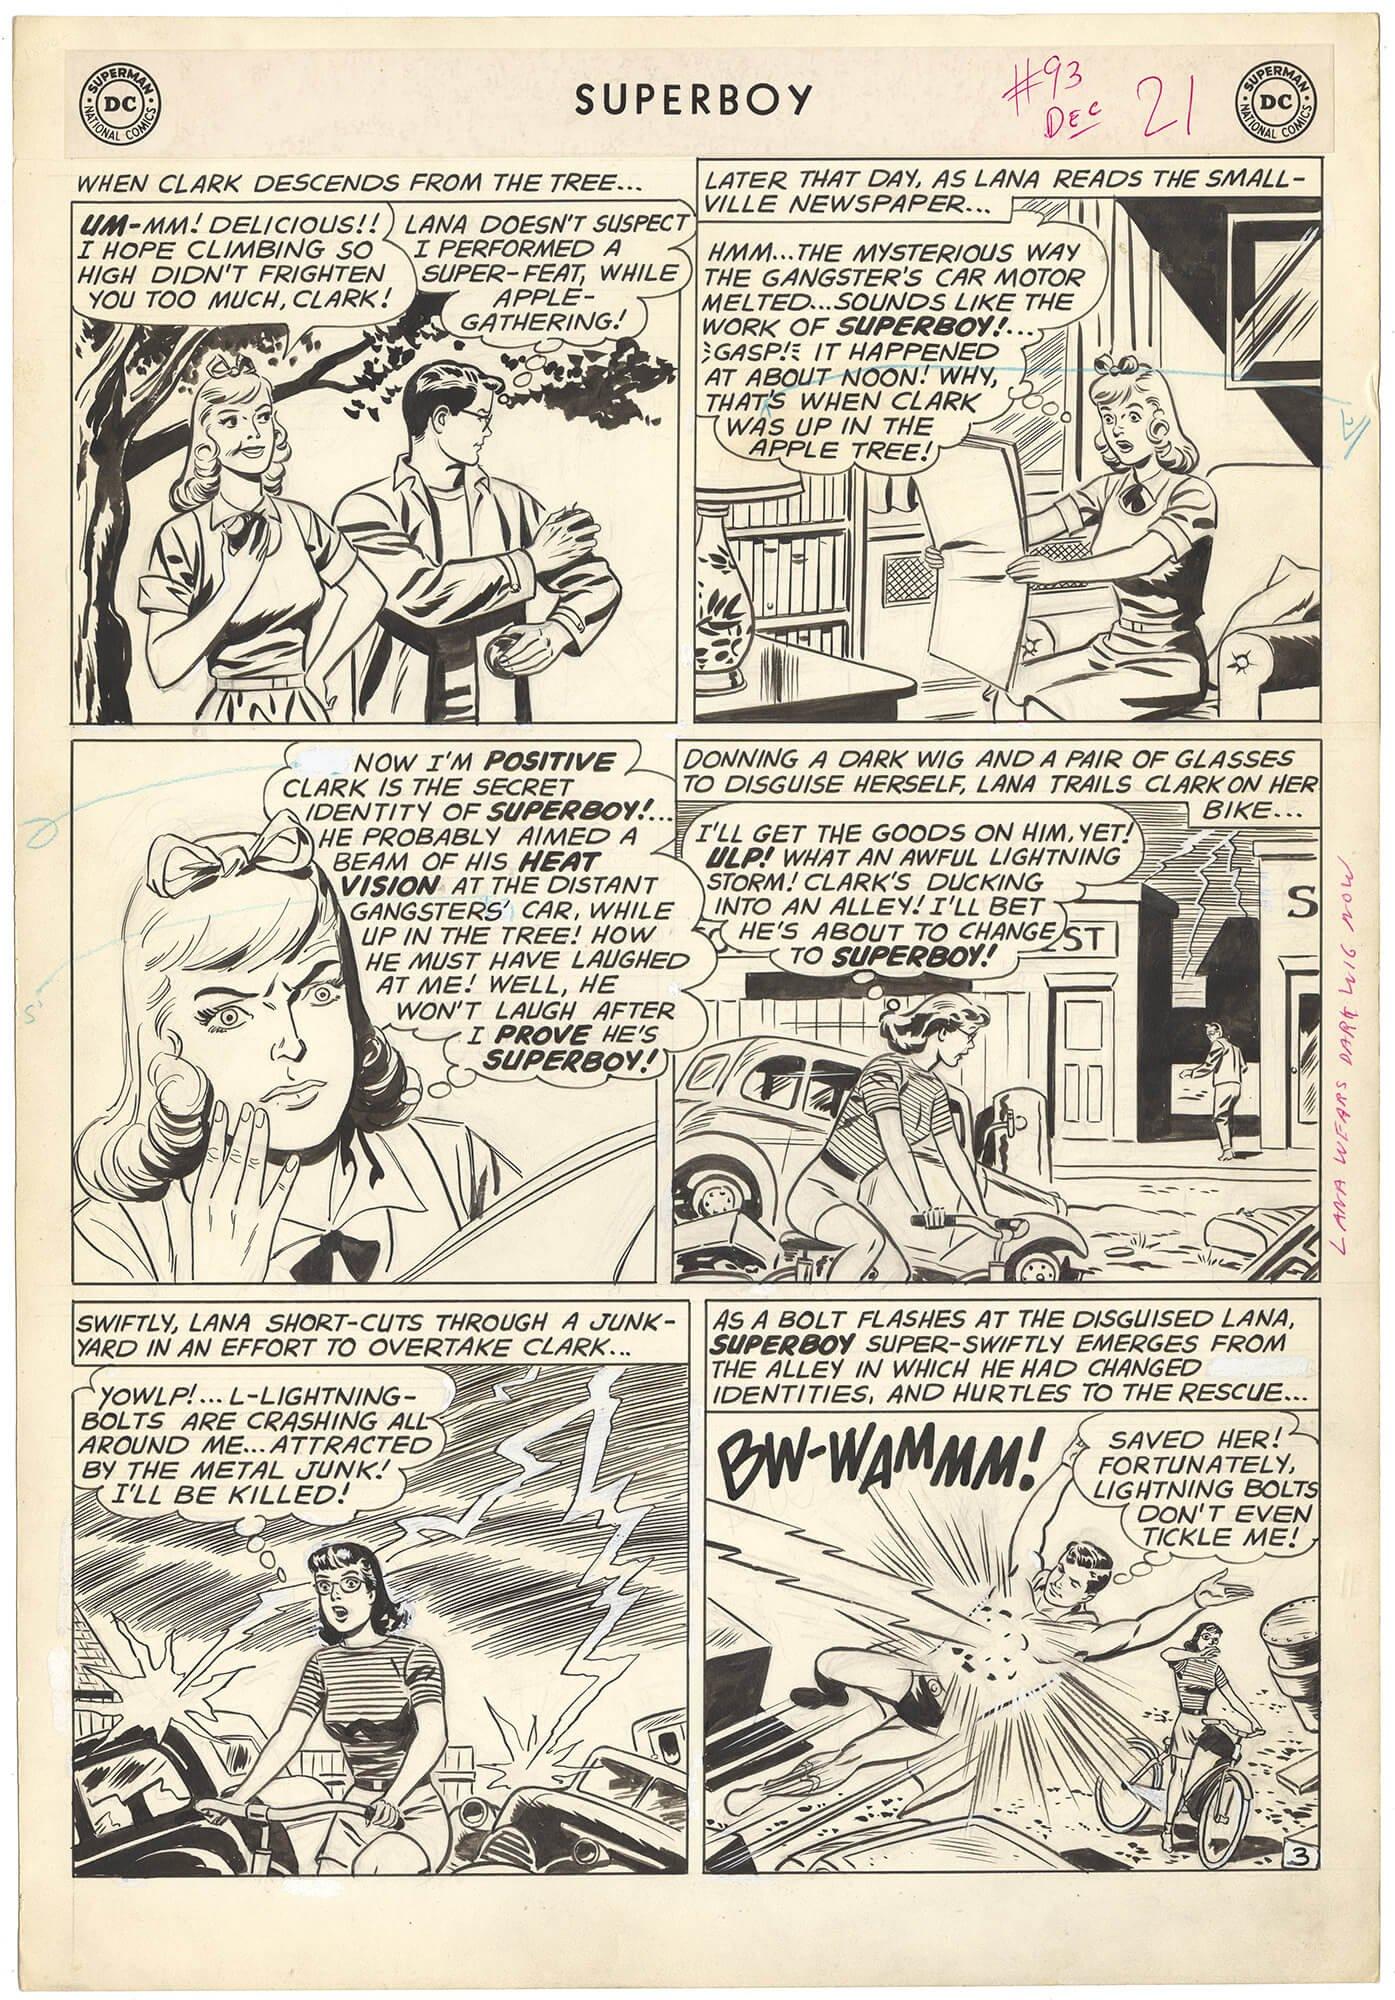 Superboy #93 p3 (Large Art)